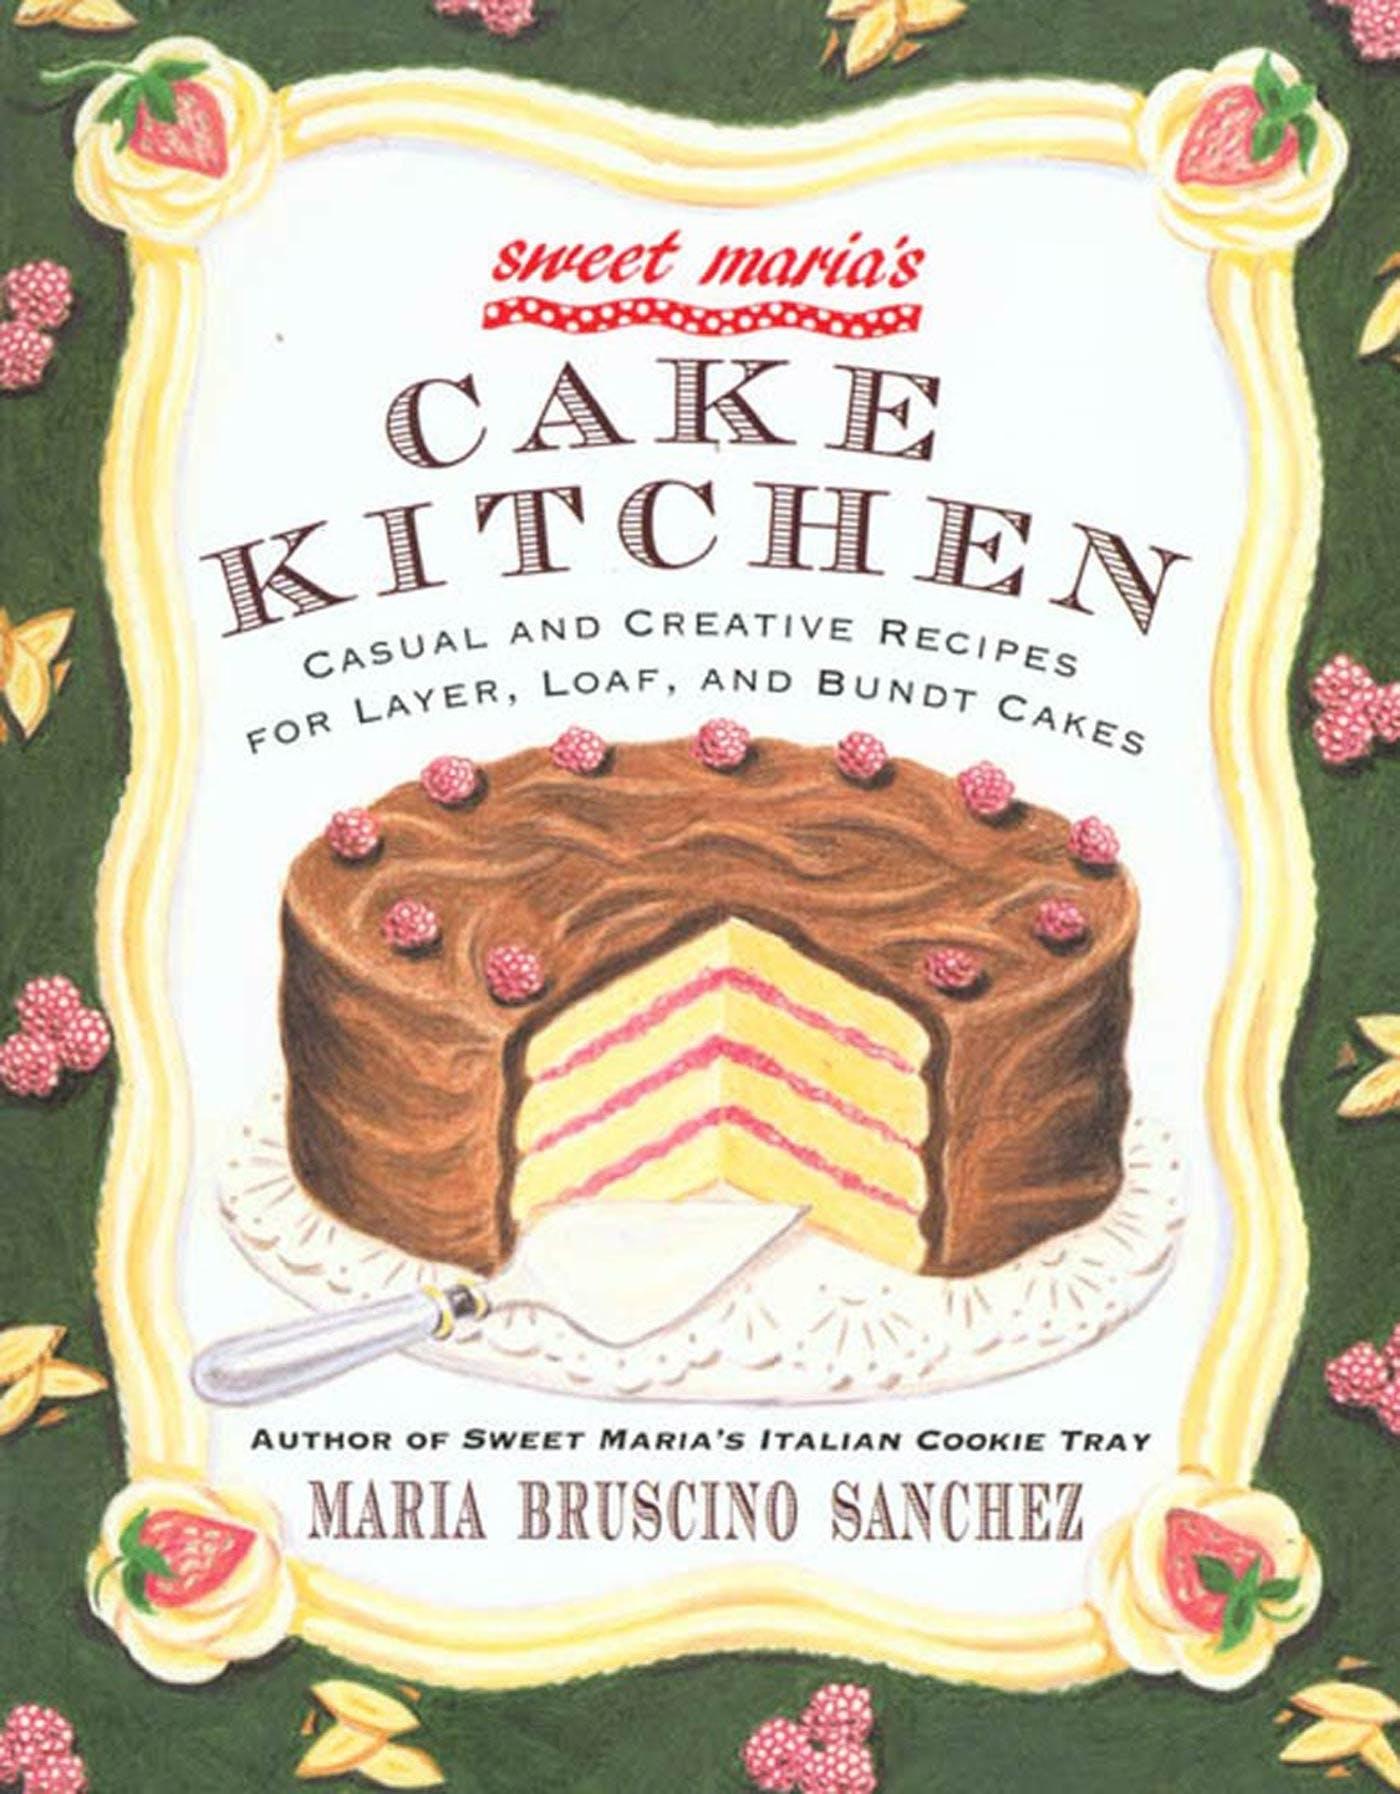 Image of Sweet Maria's Cake Kitchen